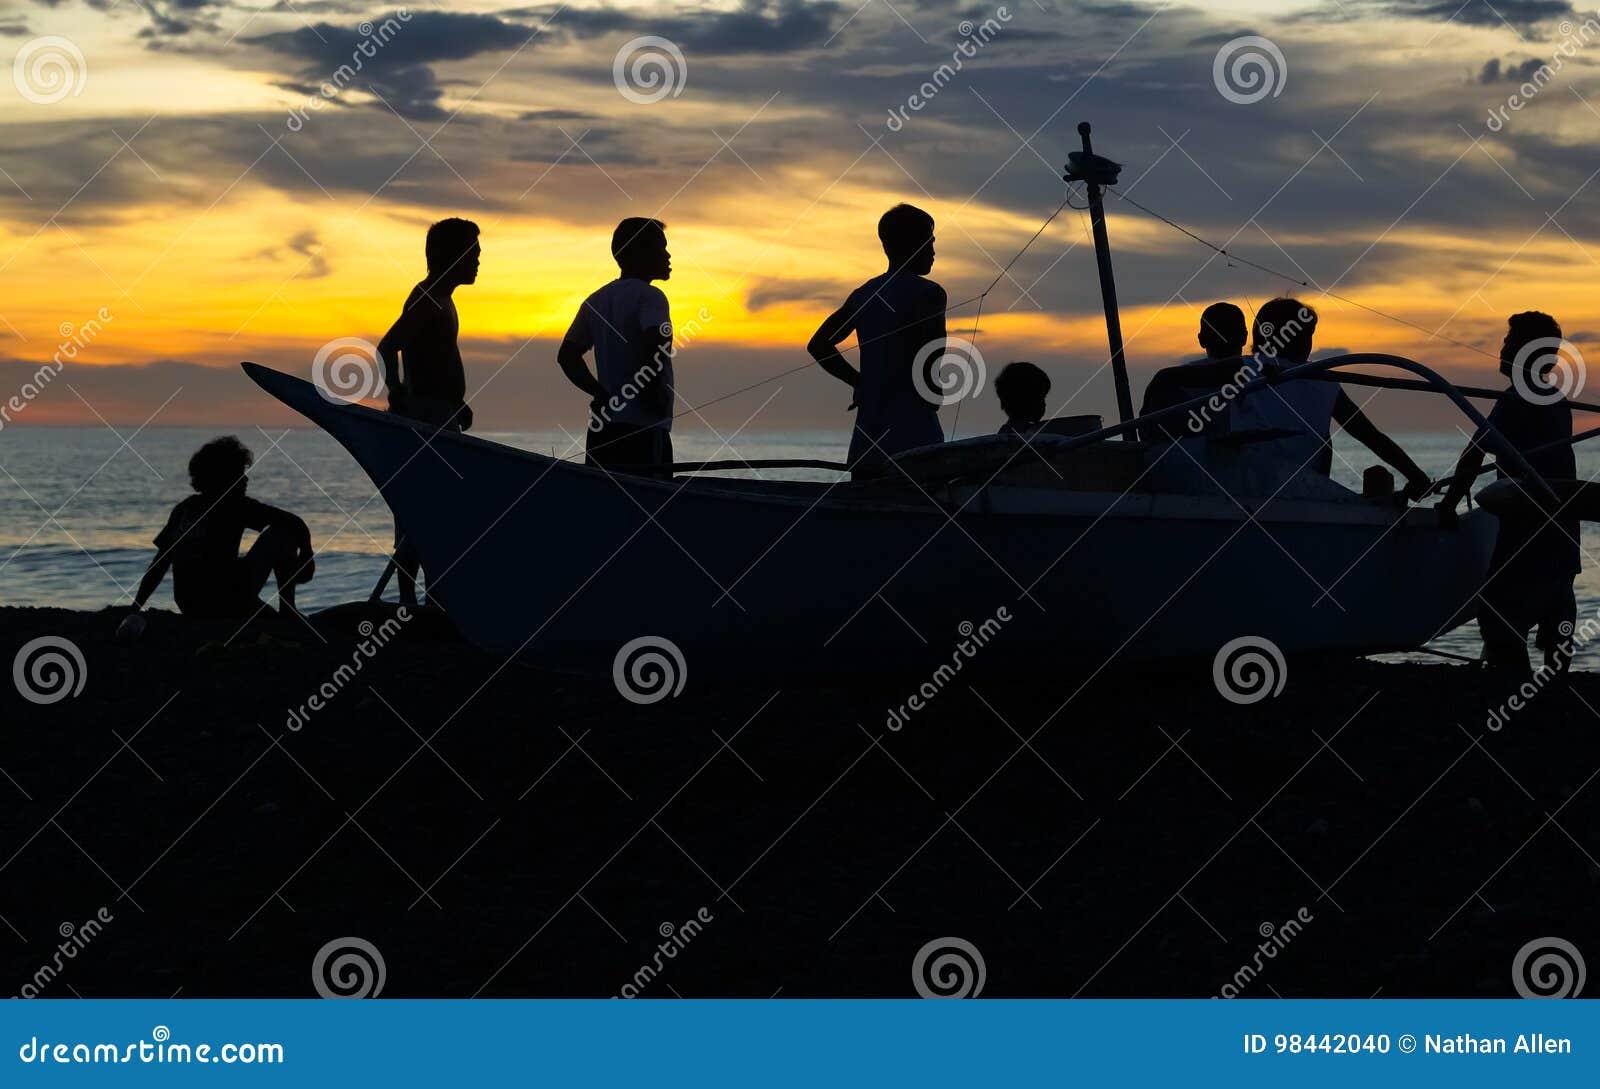 Fishermen Silhouette on Philippine Beach